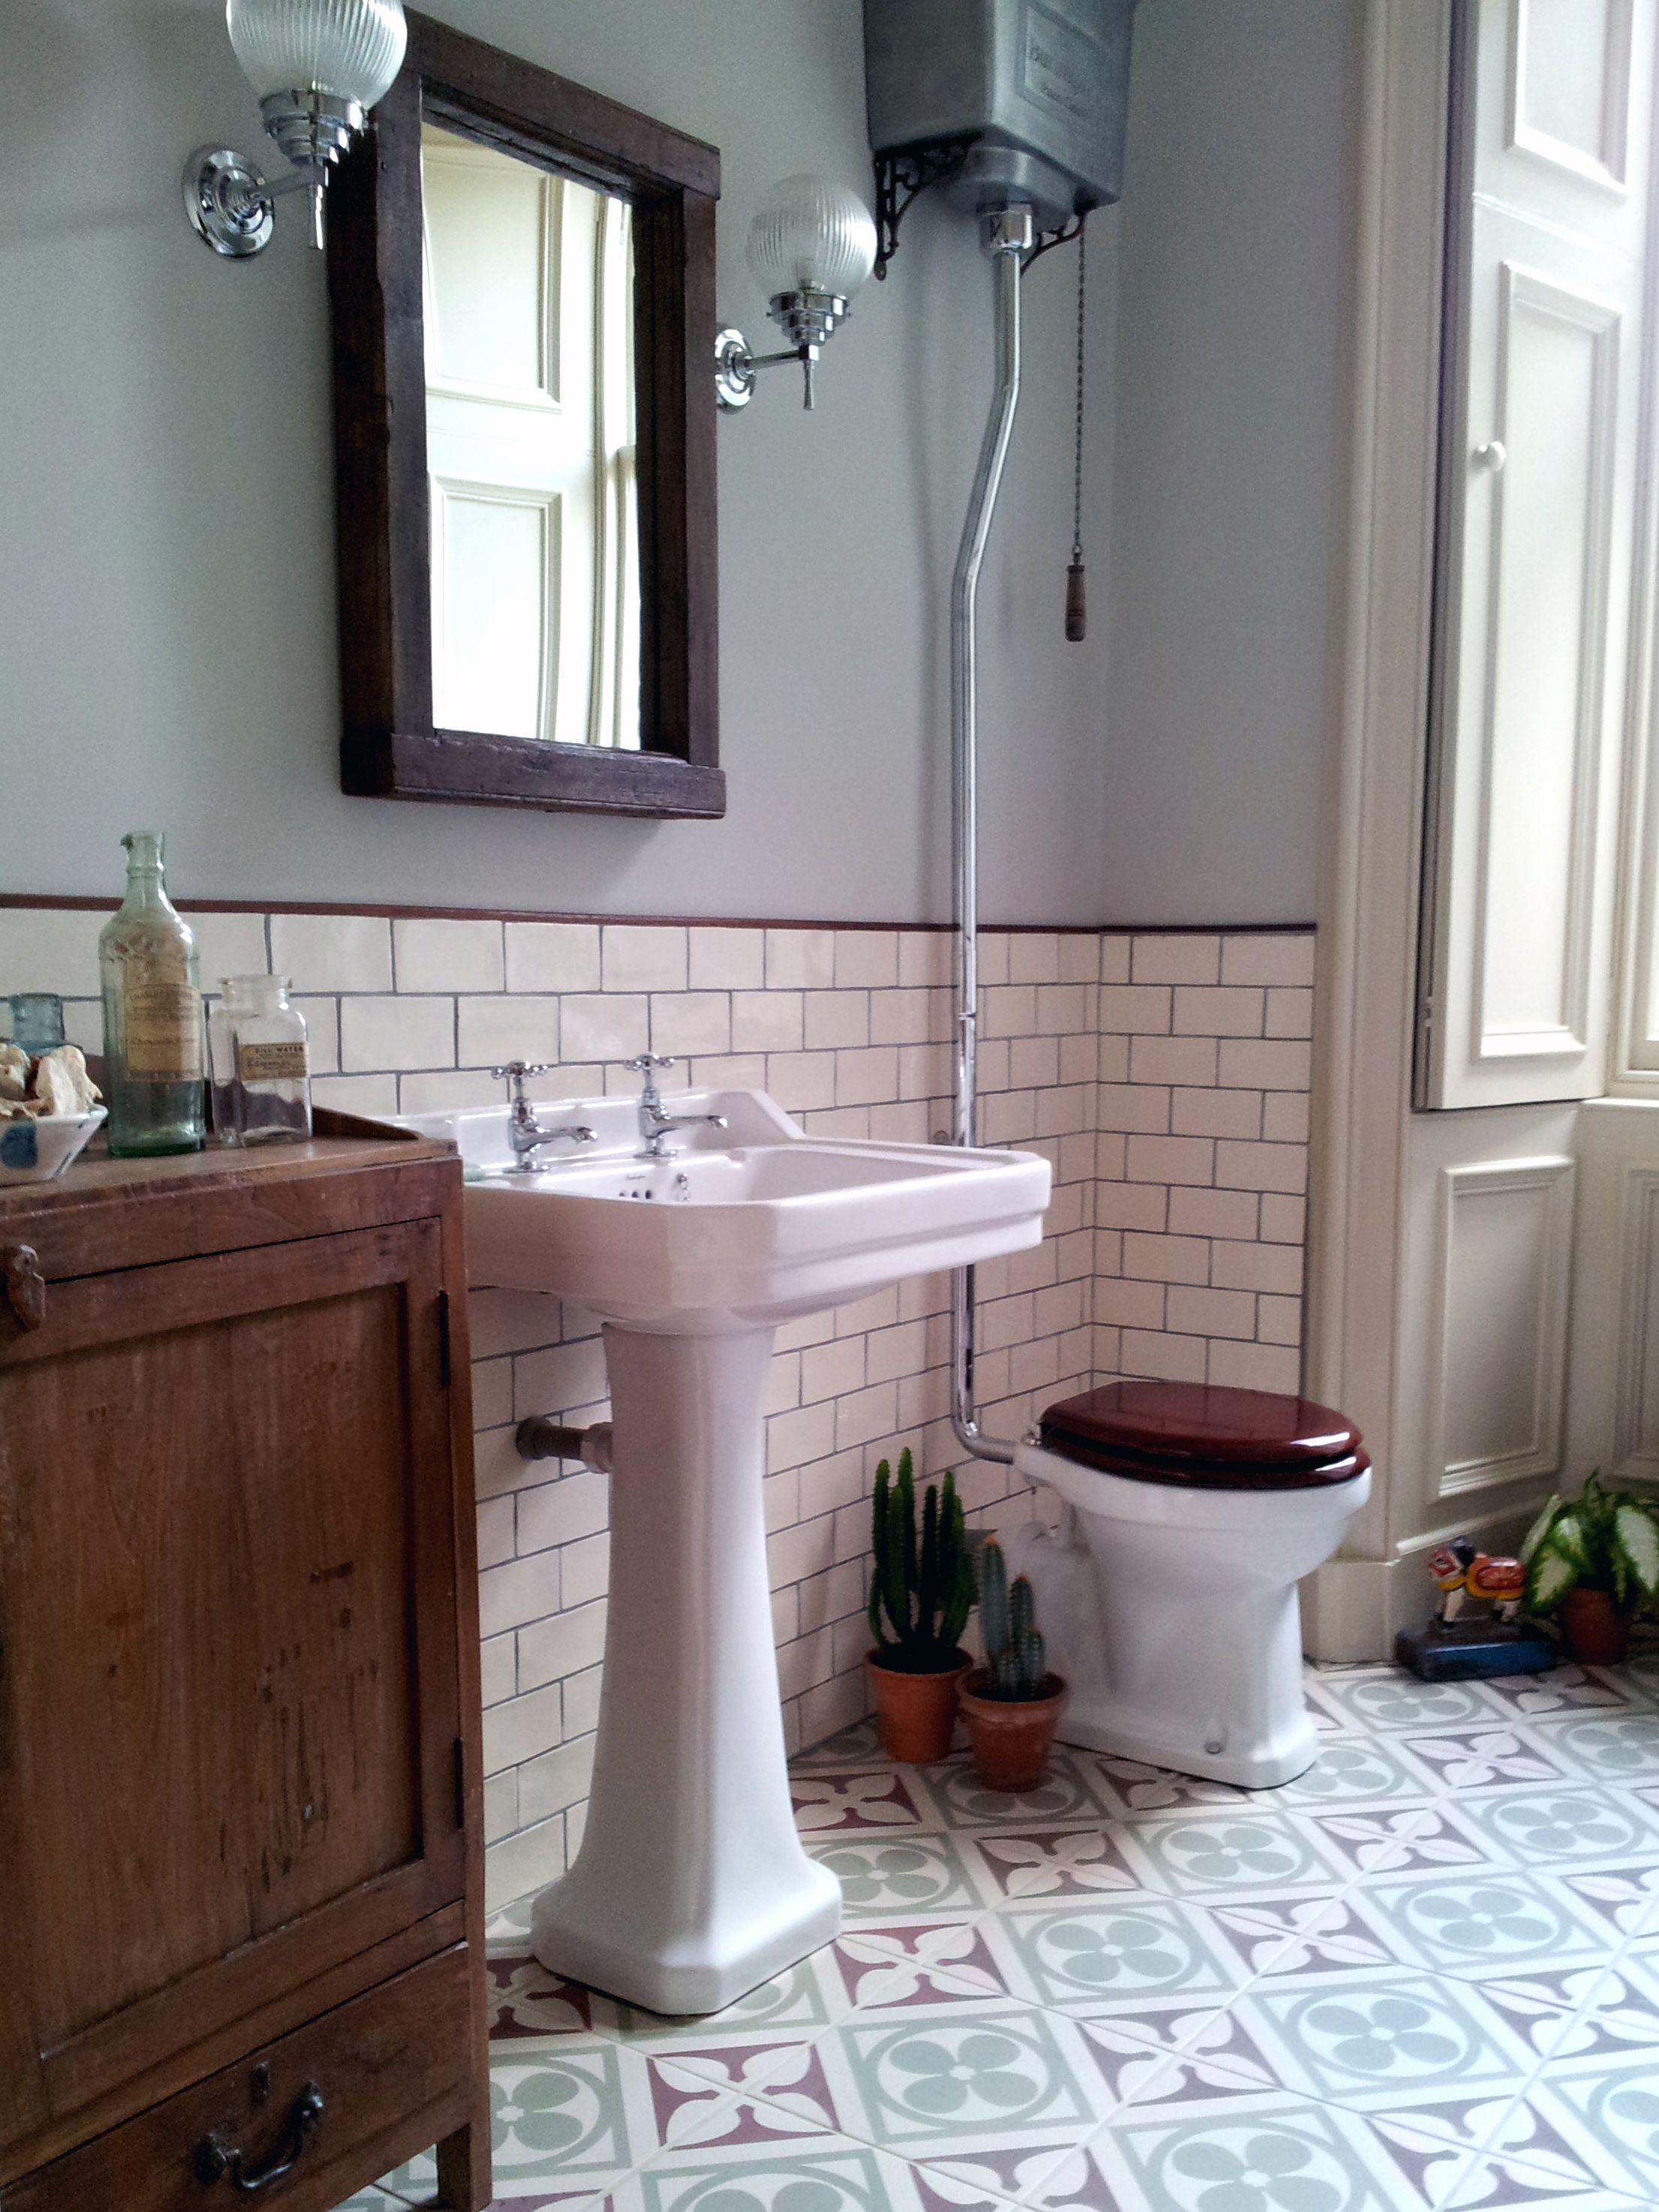 Edwardian Encaustic Tile Floor With Subway Unusual Farmhouse Bathroom Remodel Decor Ideas Storage To Save E Bathroomdecorideas